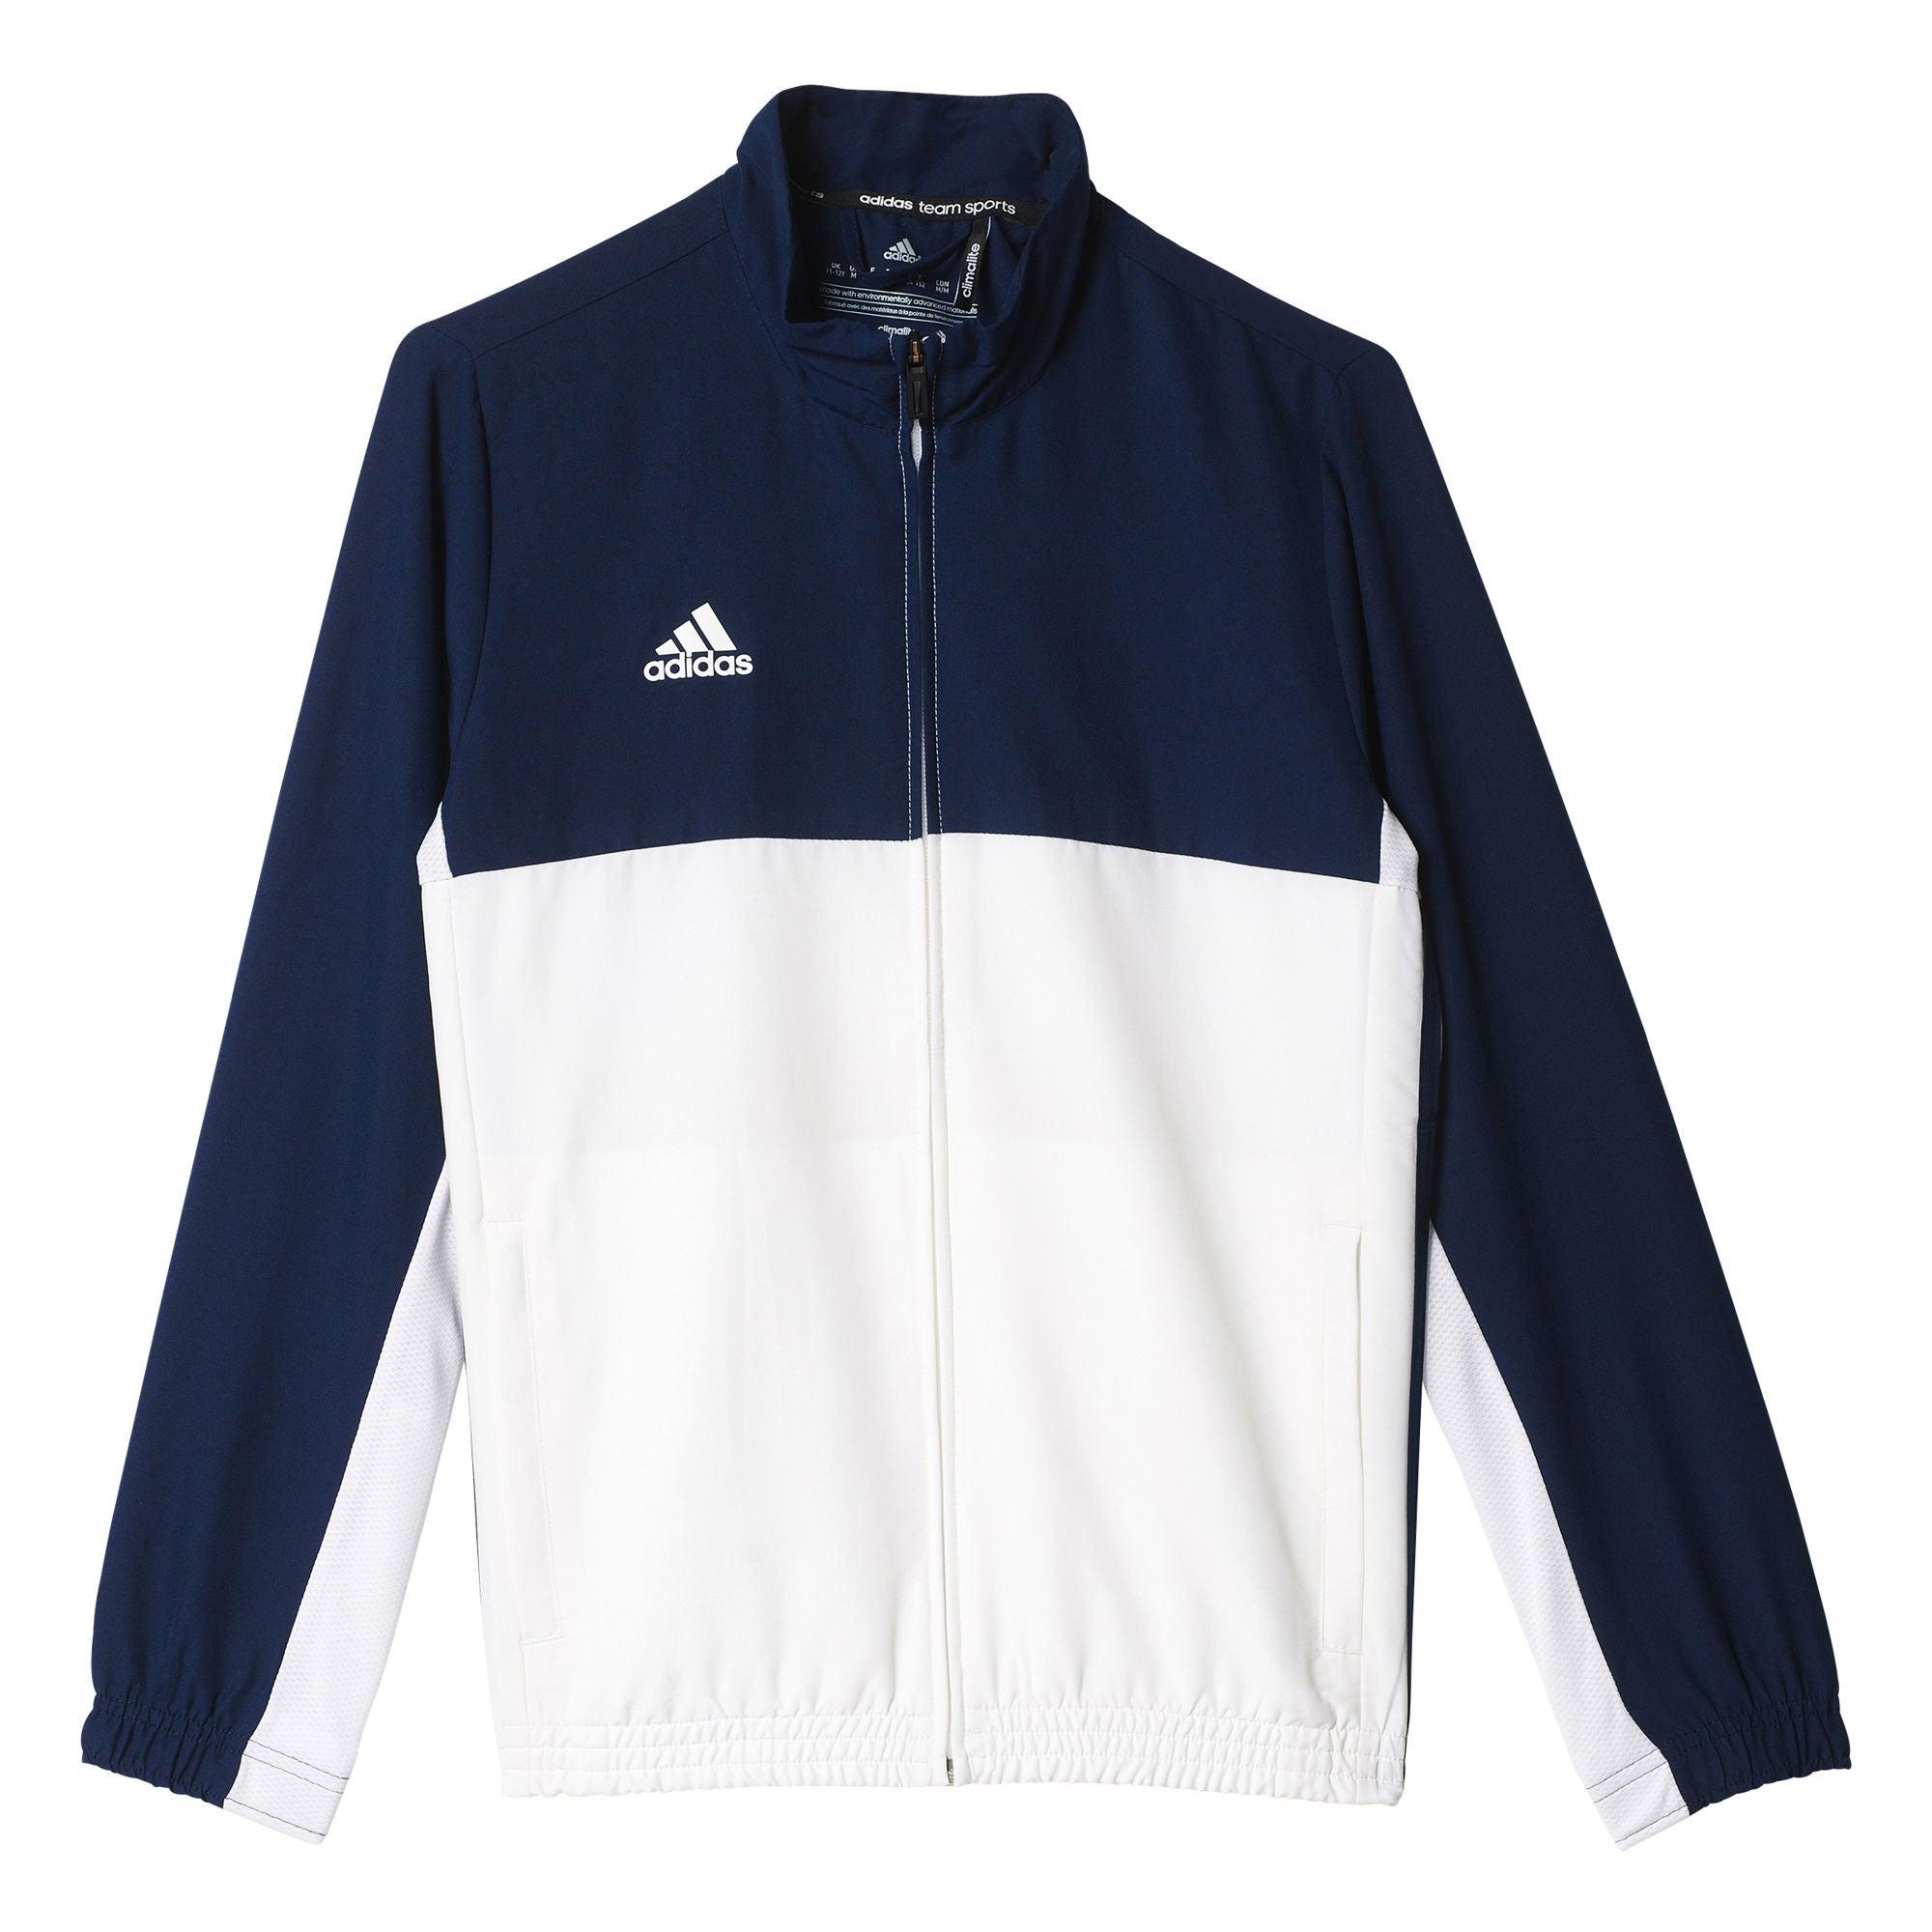 Kaufen Adidas T16 Team Jacket Y Trainingsjacke, Navy | Jollyroom